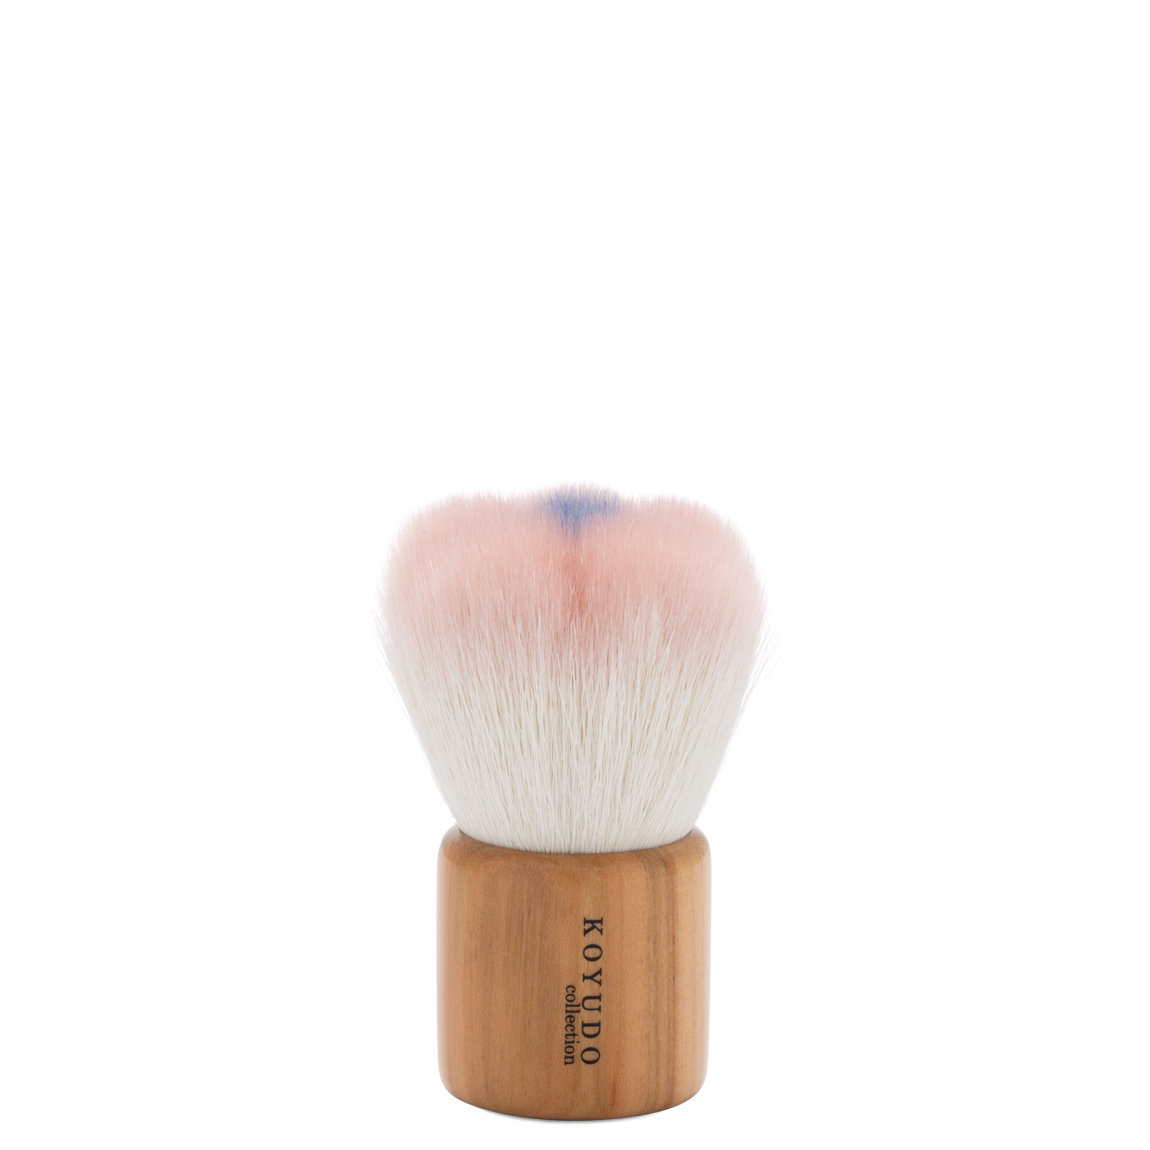 KOYUDO Innovative Series F001 Powder/Blush Brush - Pink alternative view 1 - product swatch.